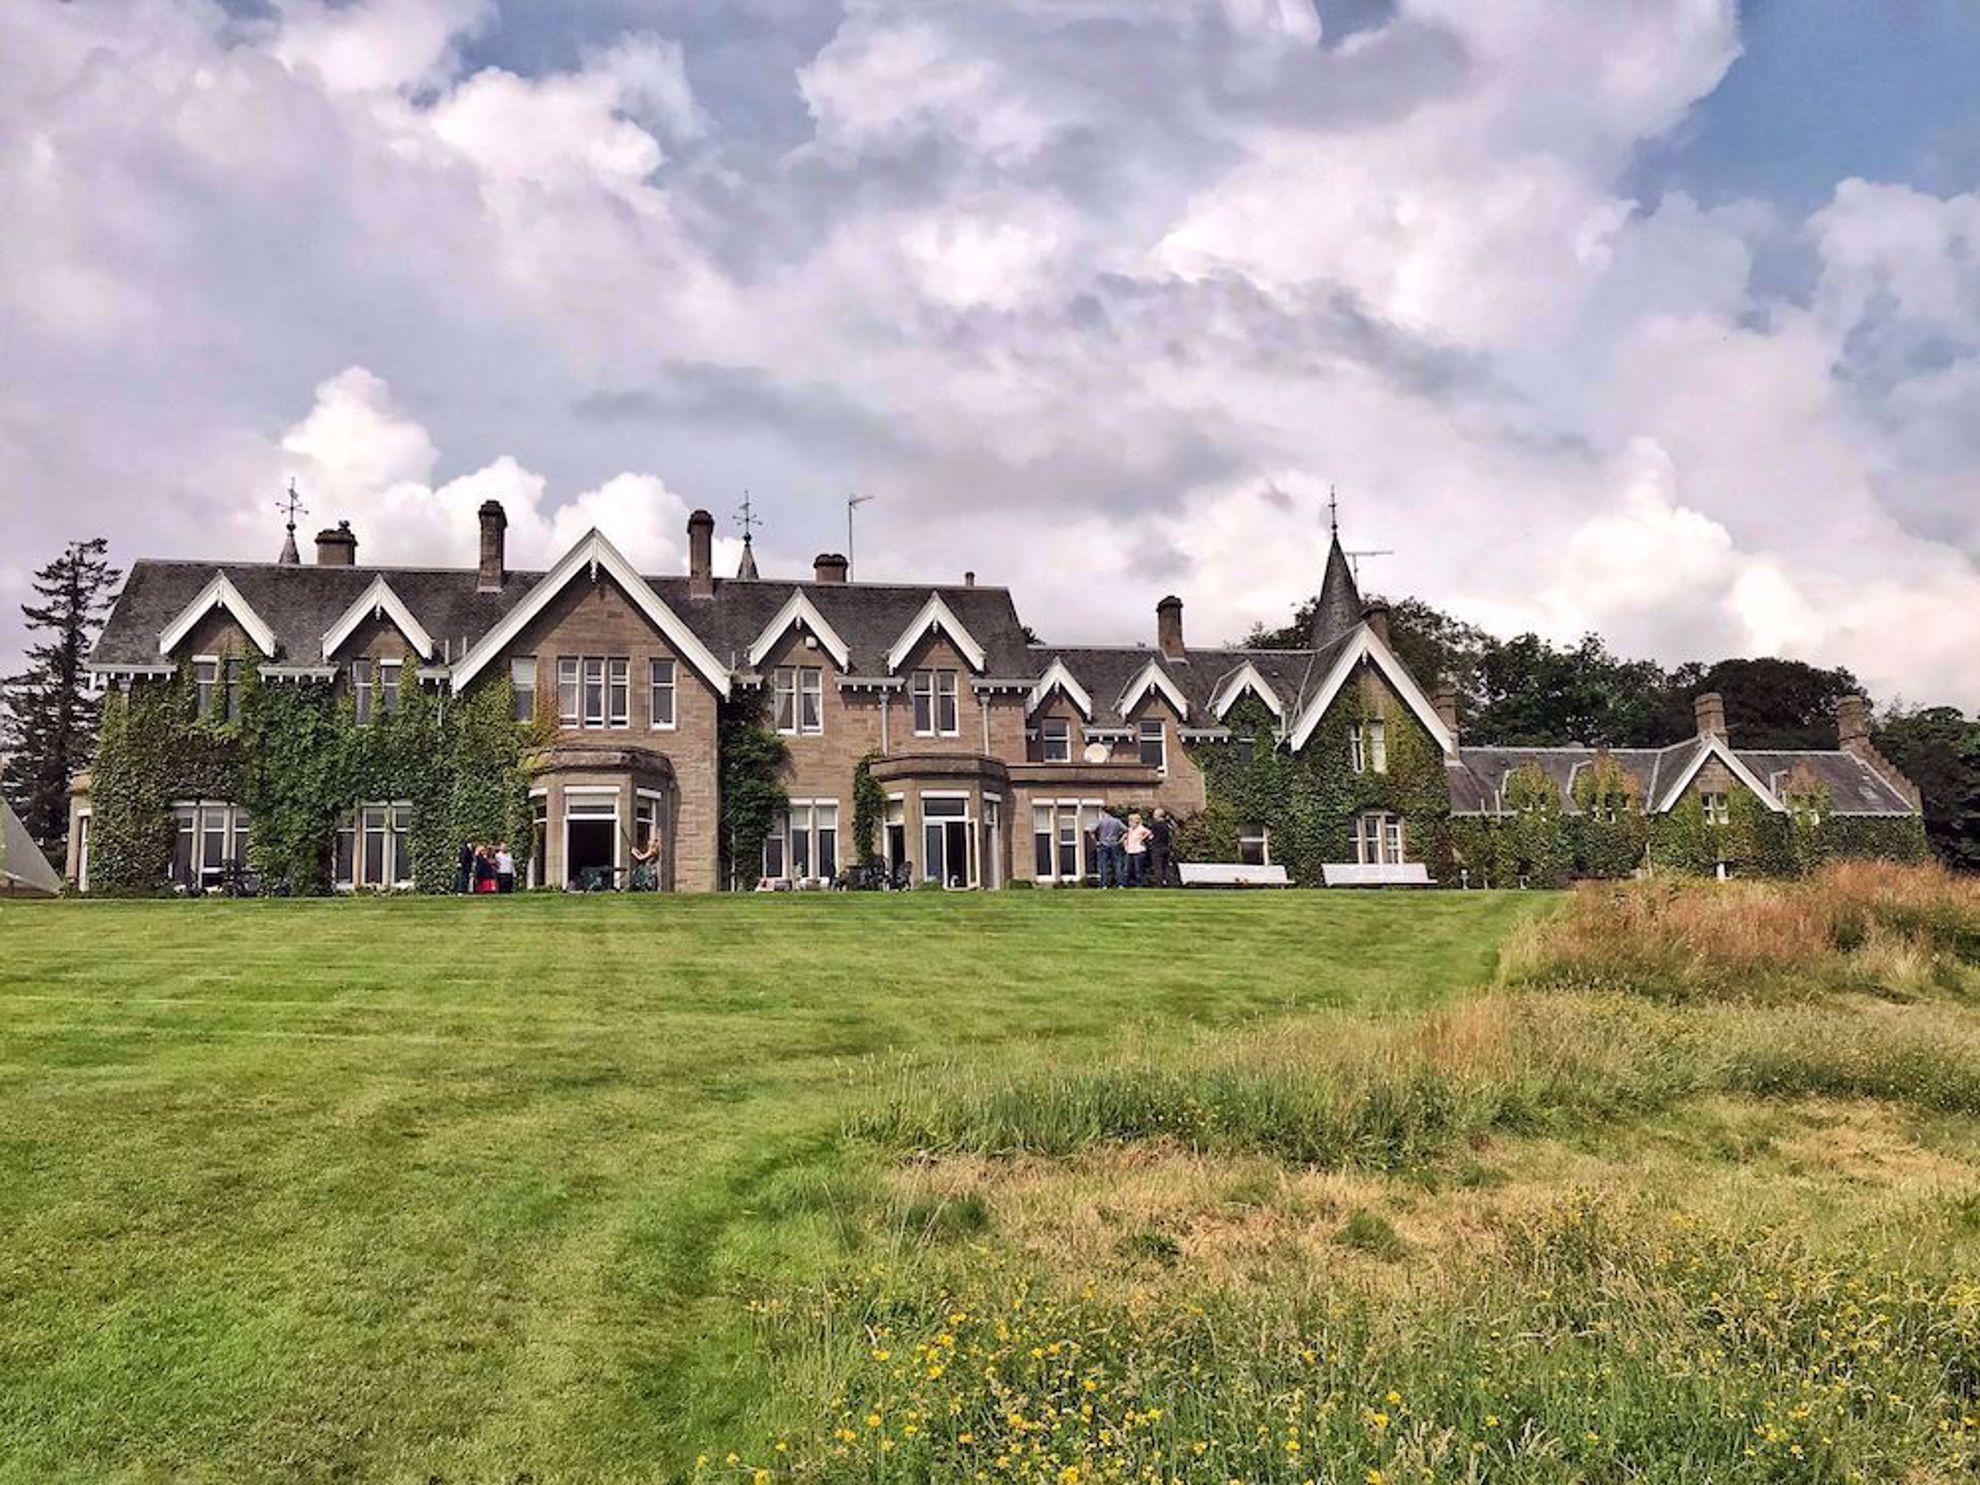 Ballathie House - Perthshire, Scotland